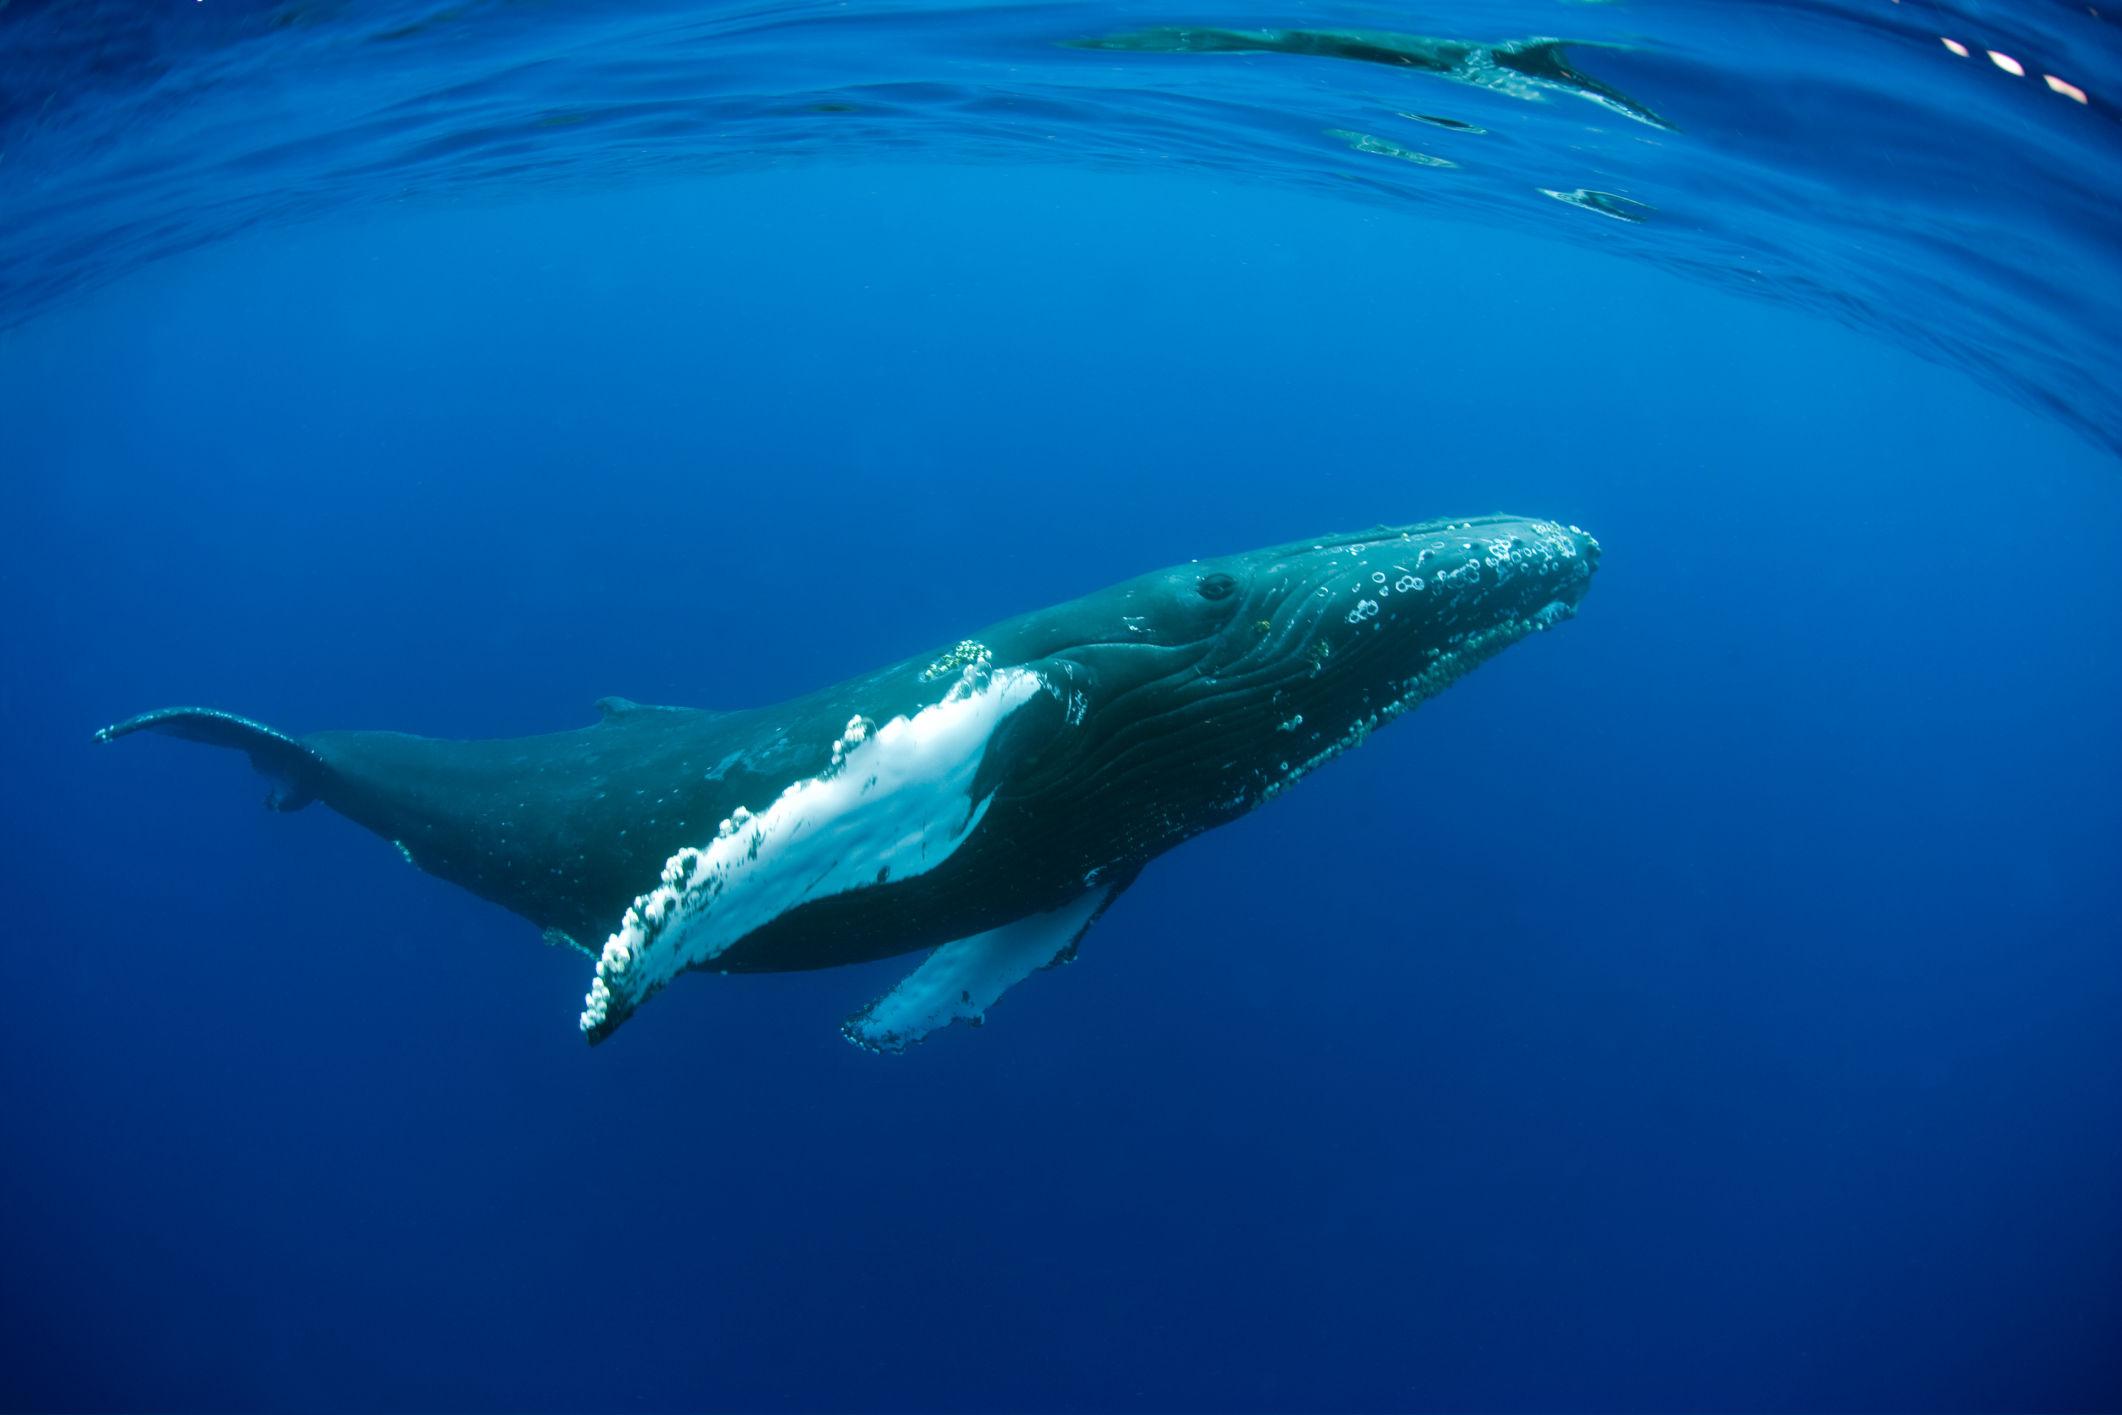 whales, fish, Ocean Unite, Ocean Conservation